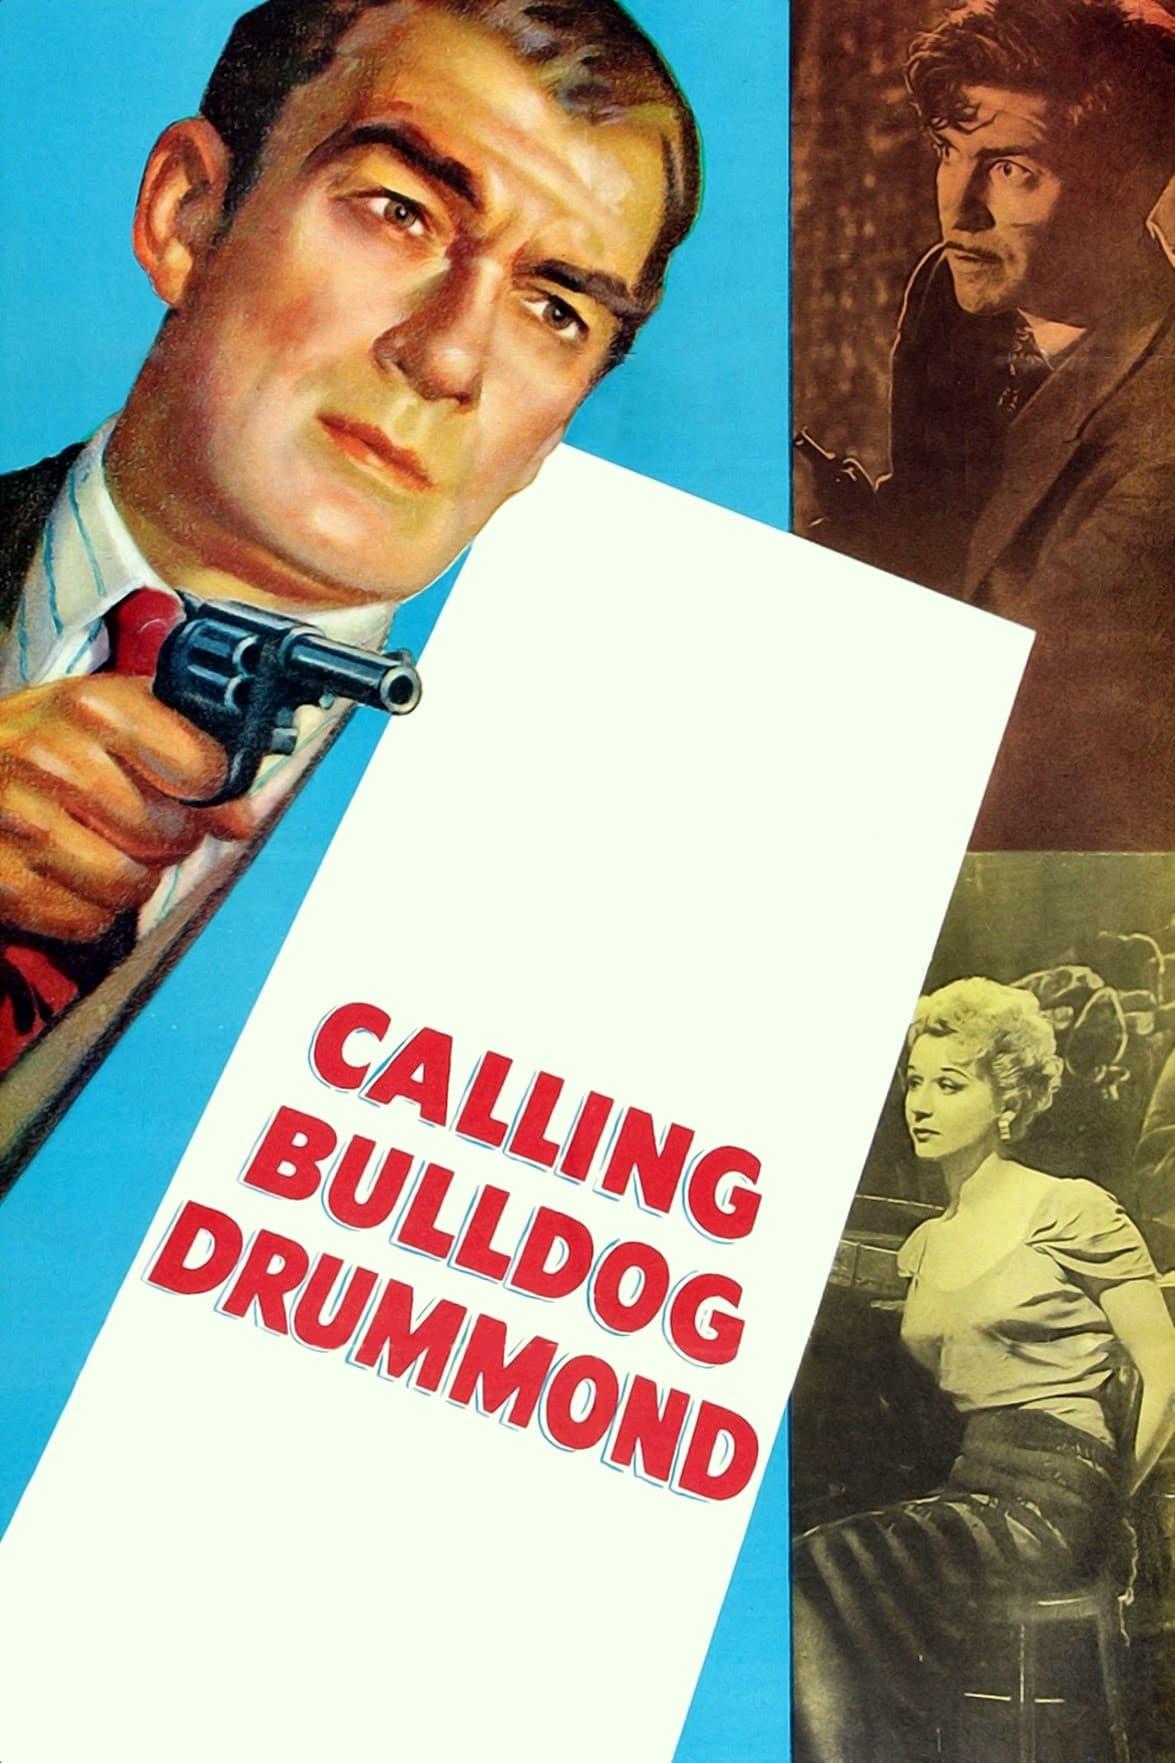 Le Retour de Bulldog Drummond